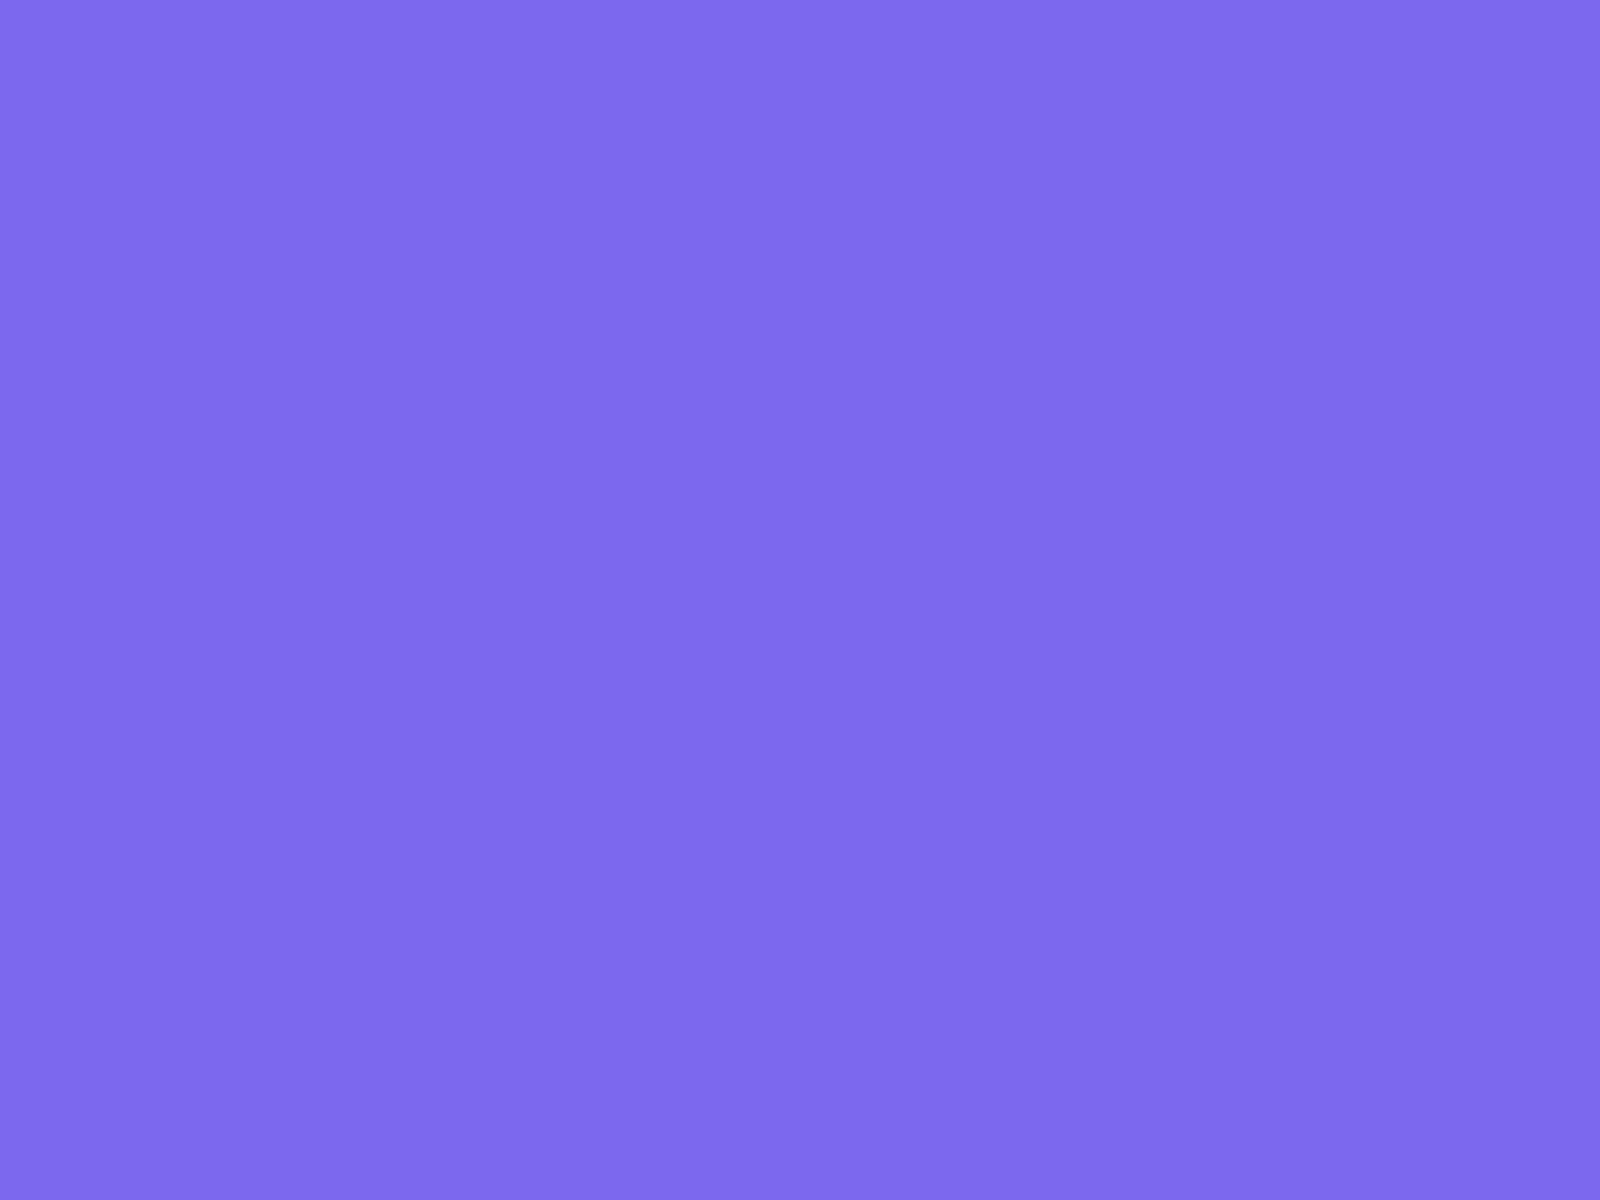 1600x1200 Medium Slate Blue Solid Color Background